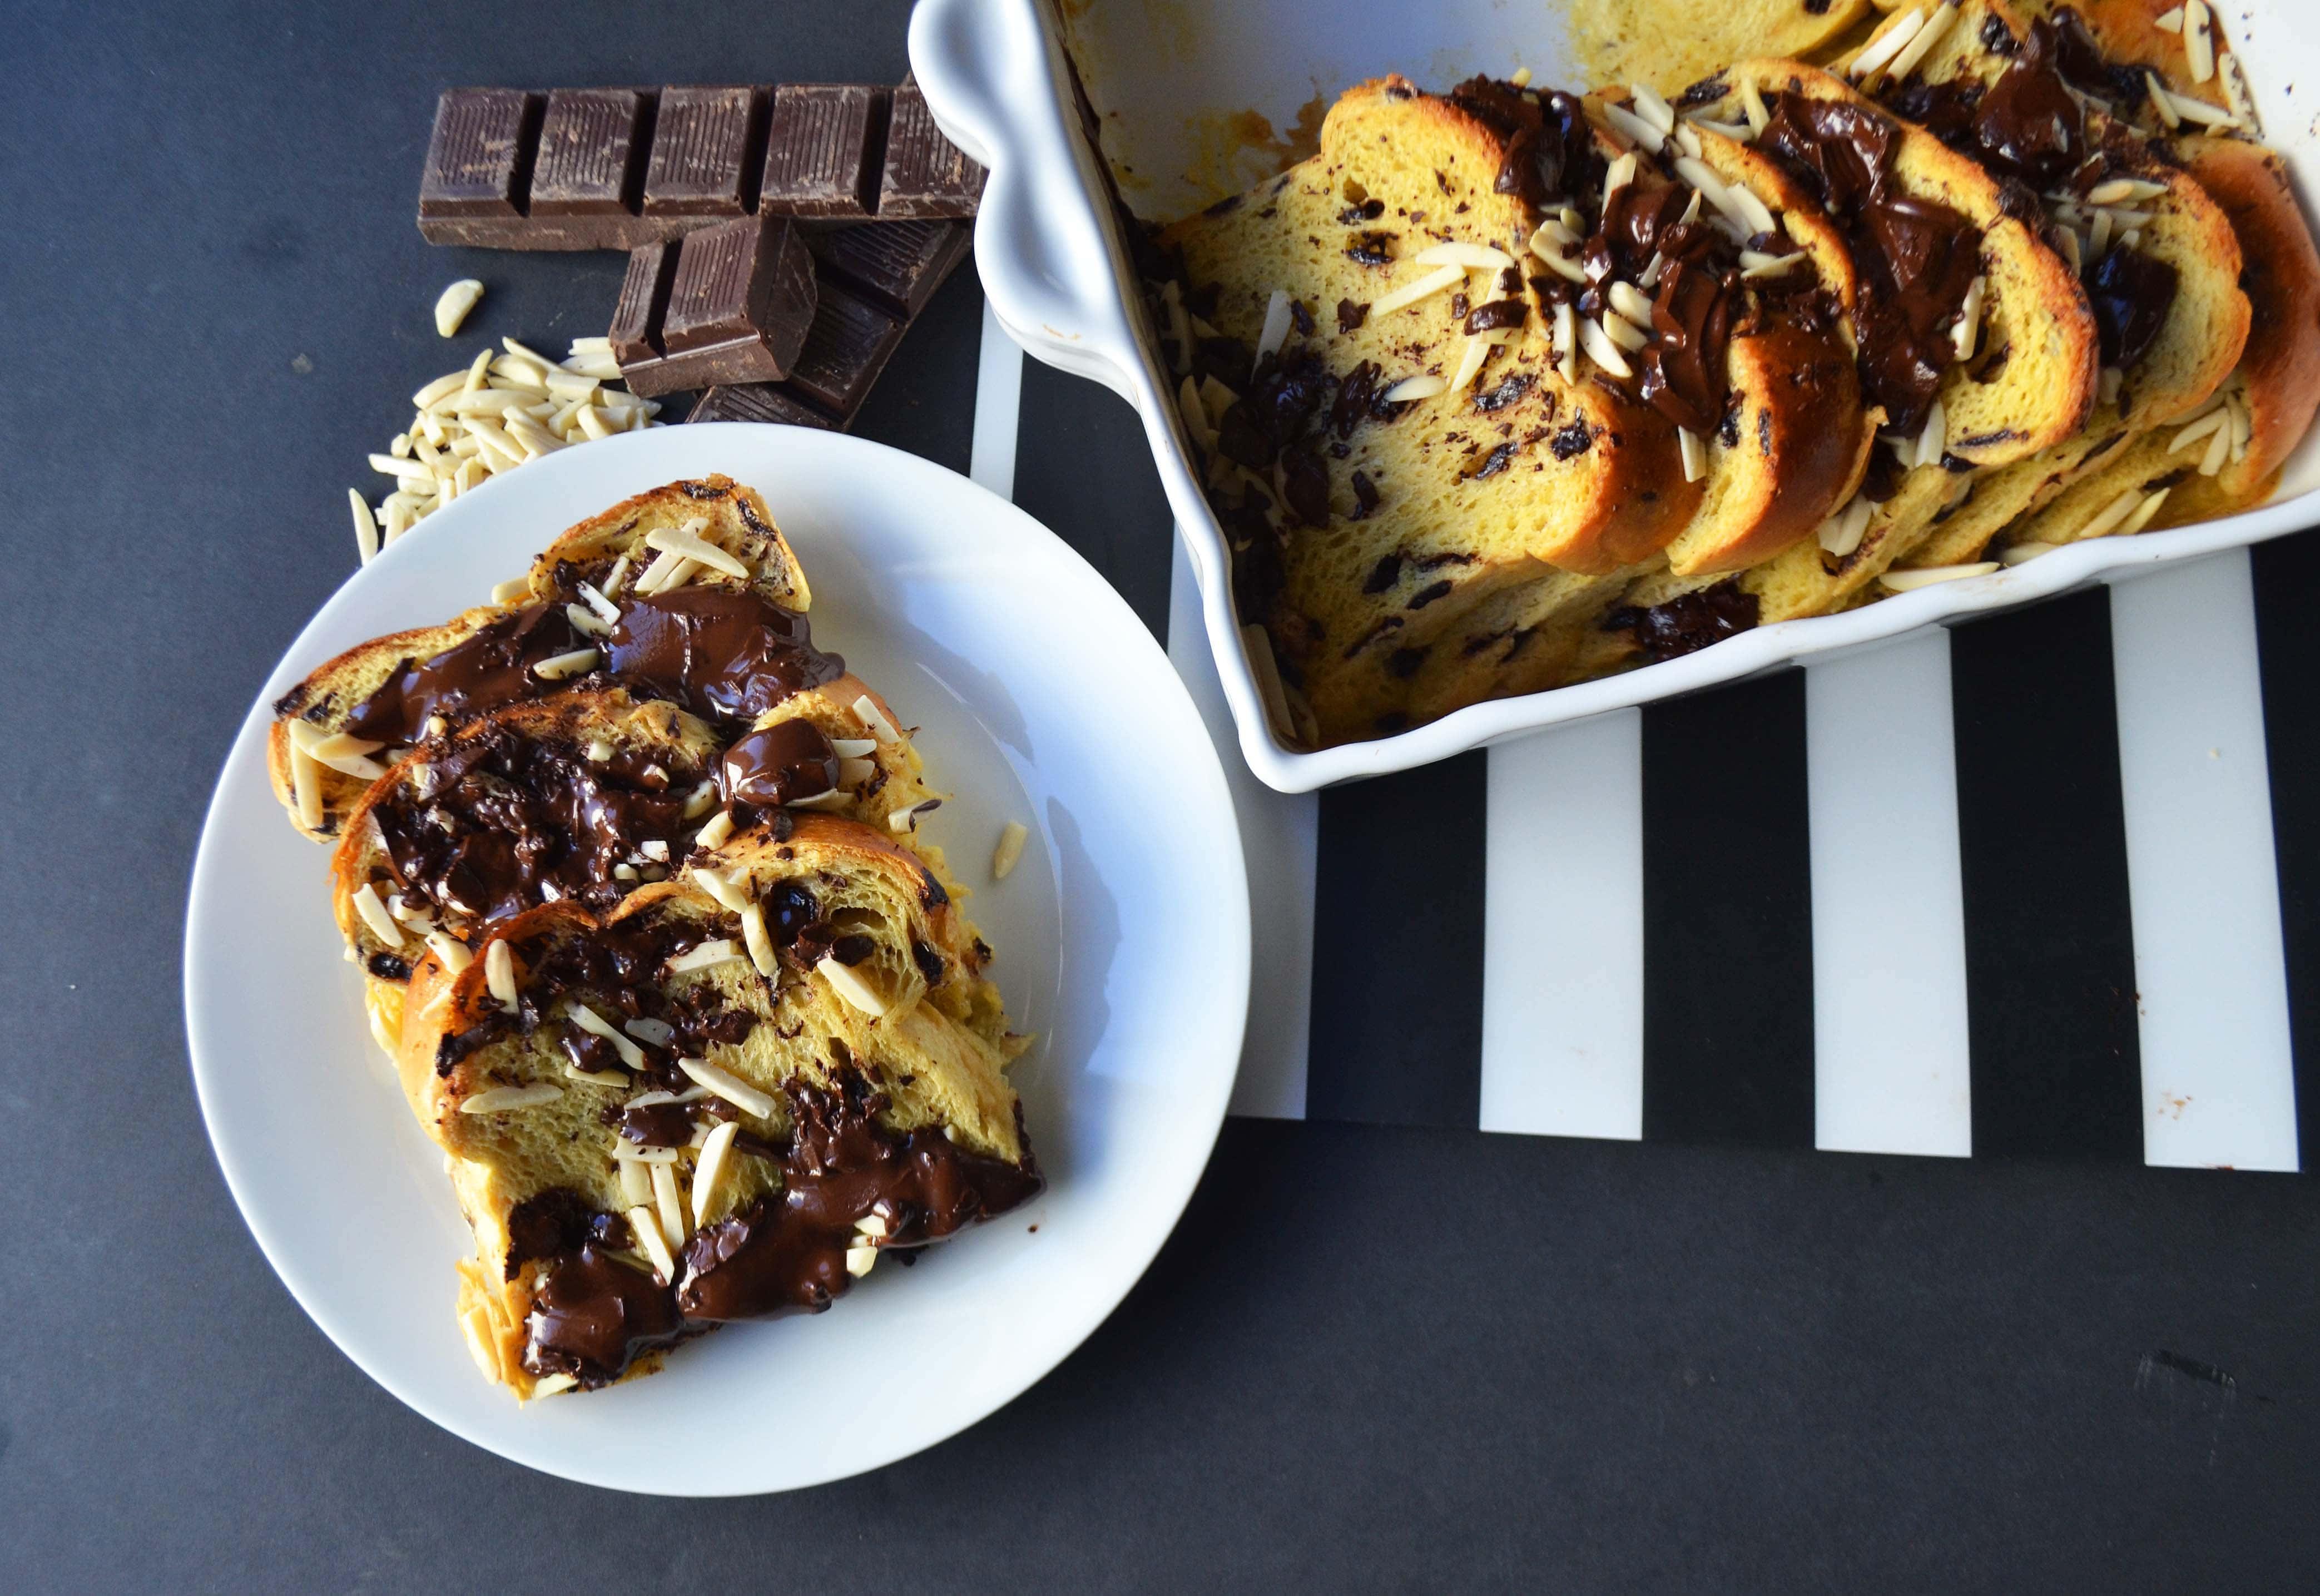 Chocolate Almond Brioche Baked French Toast | Modern Honey